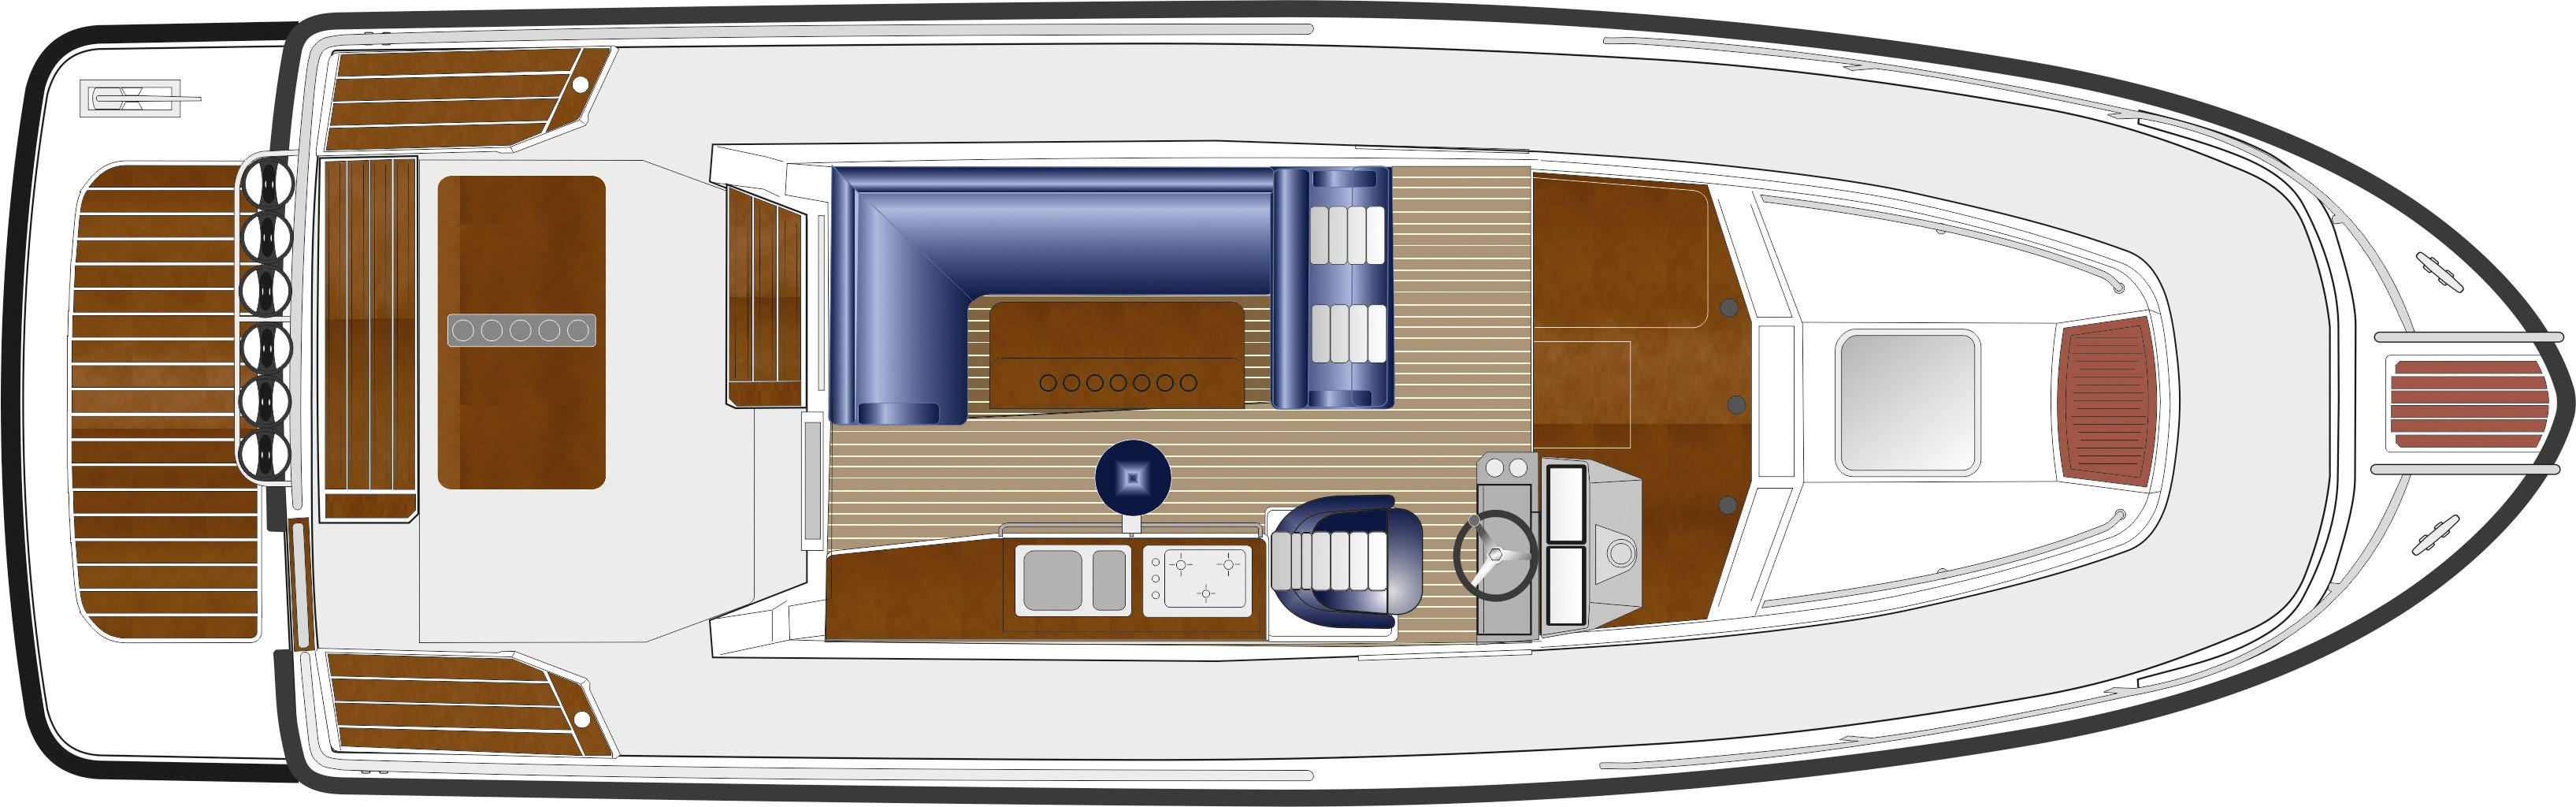 Sargo 33 Explorer - internal deck plan